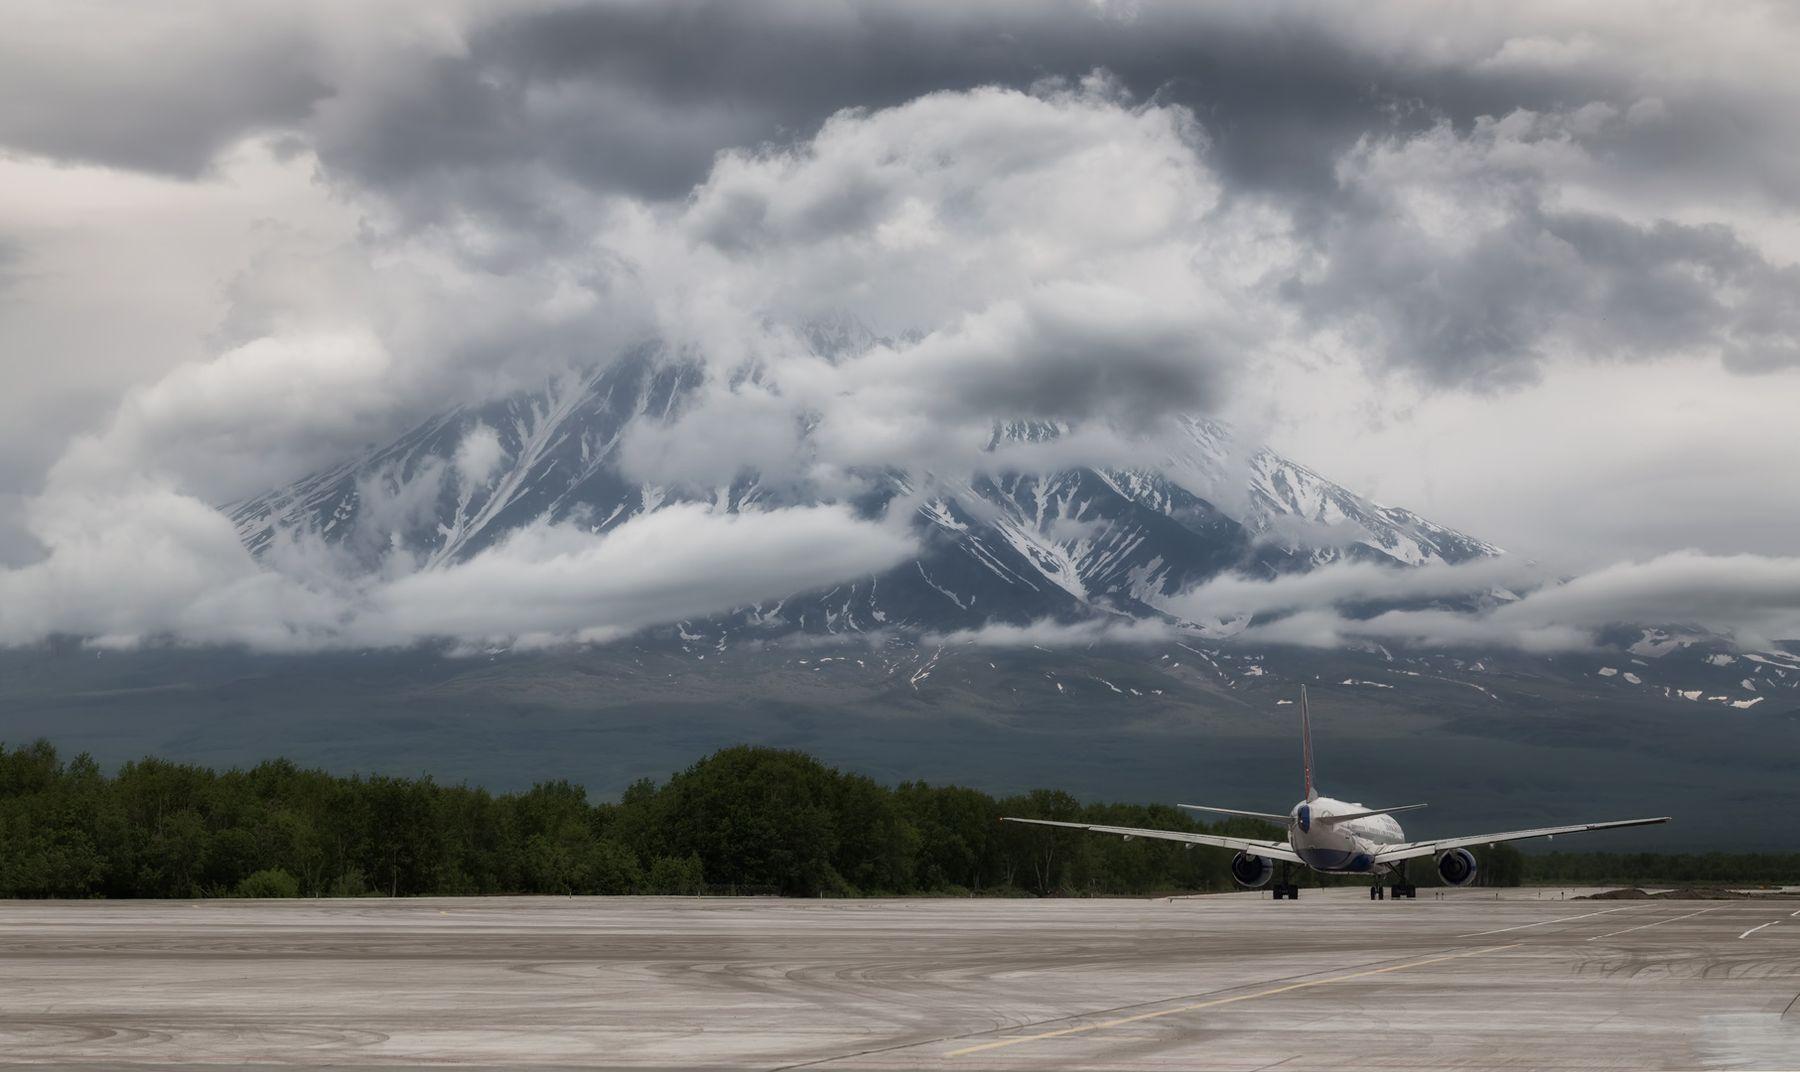 на взлёте вулкан Камчатка лето самолет тучи аэропорт Елизово